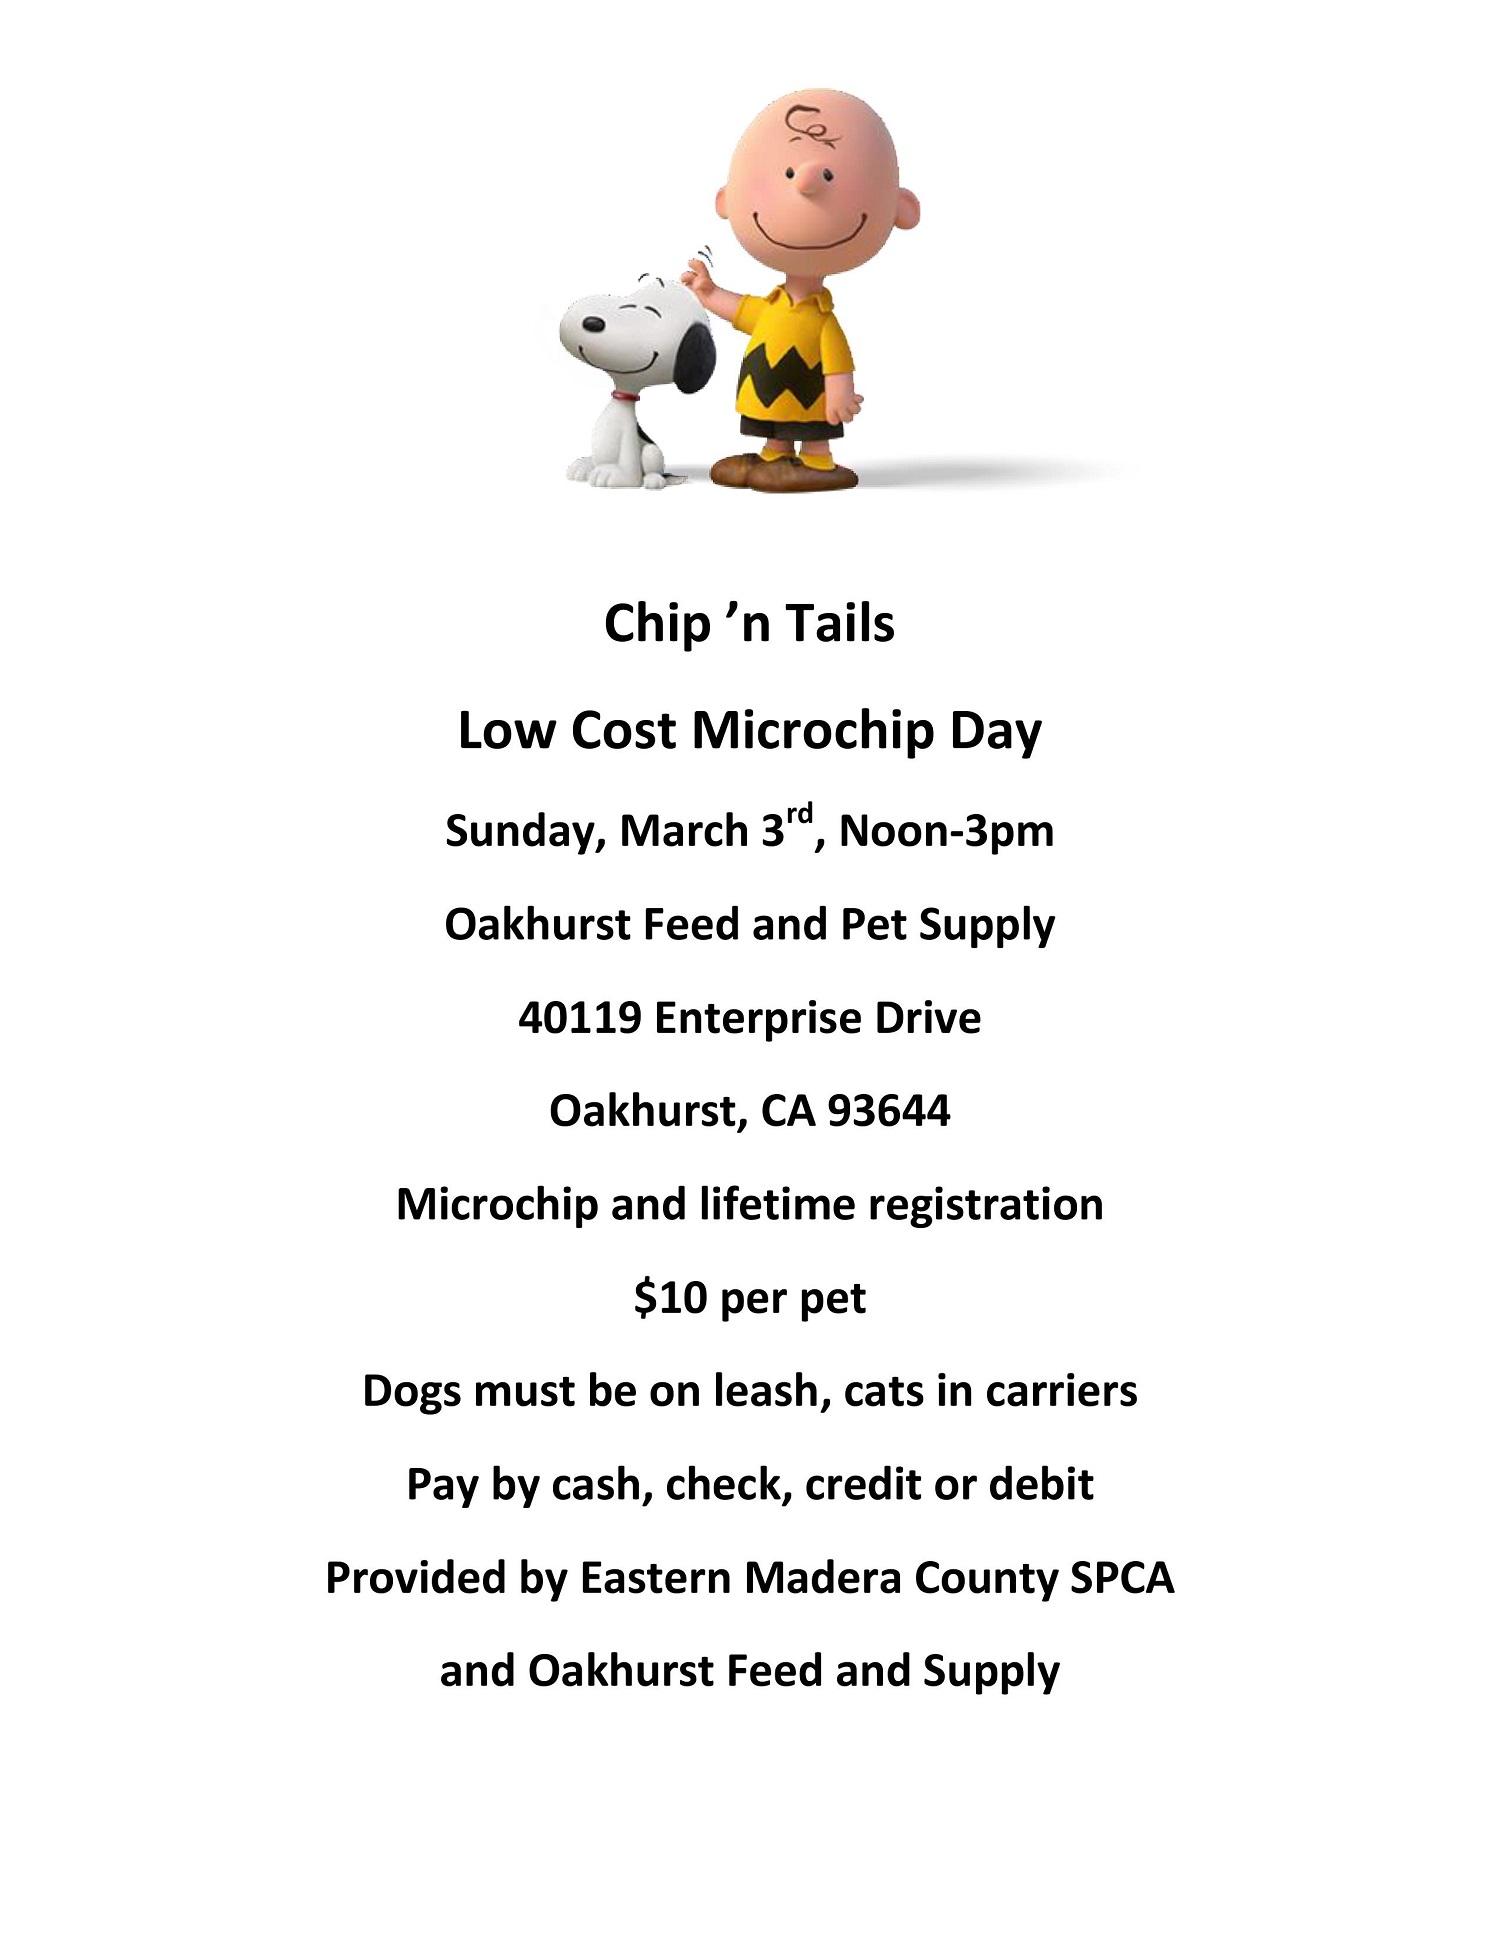 Eastern Madera County SPCA : News & Events : Event Calendar